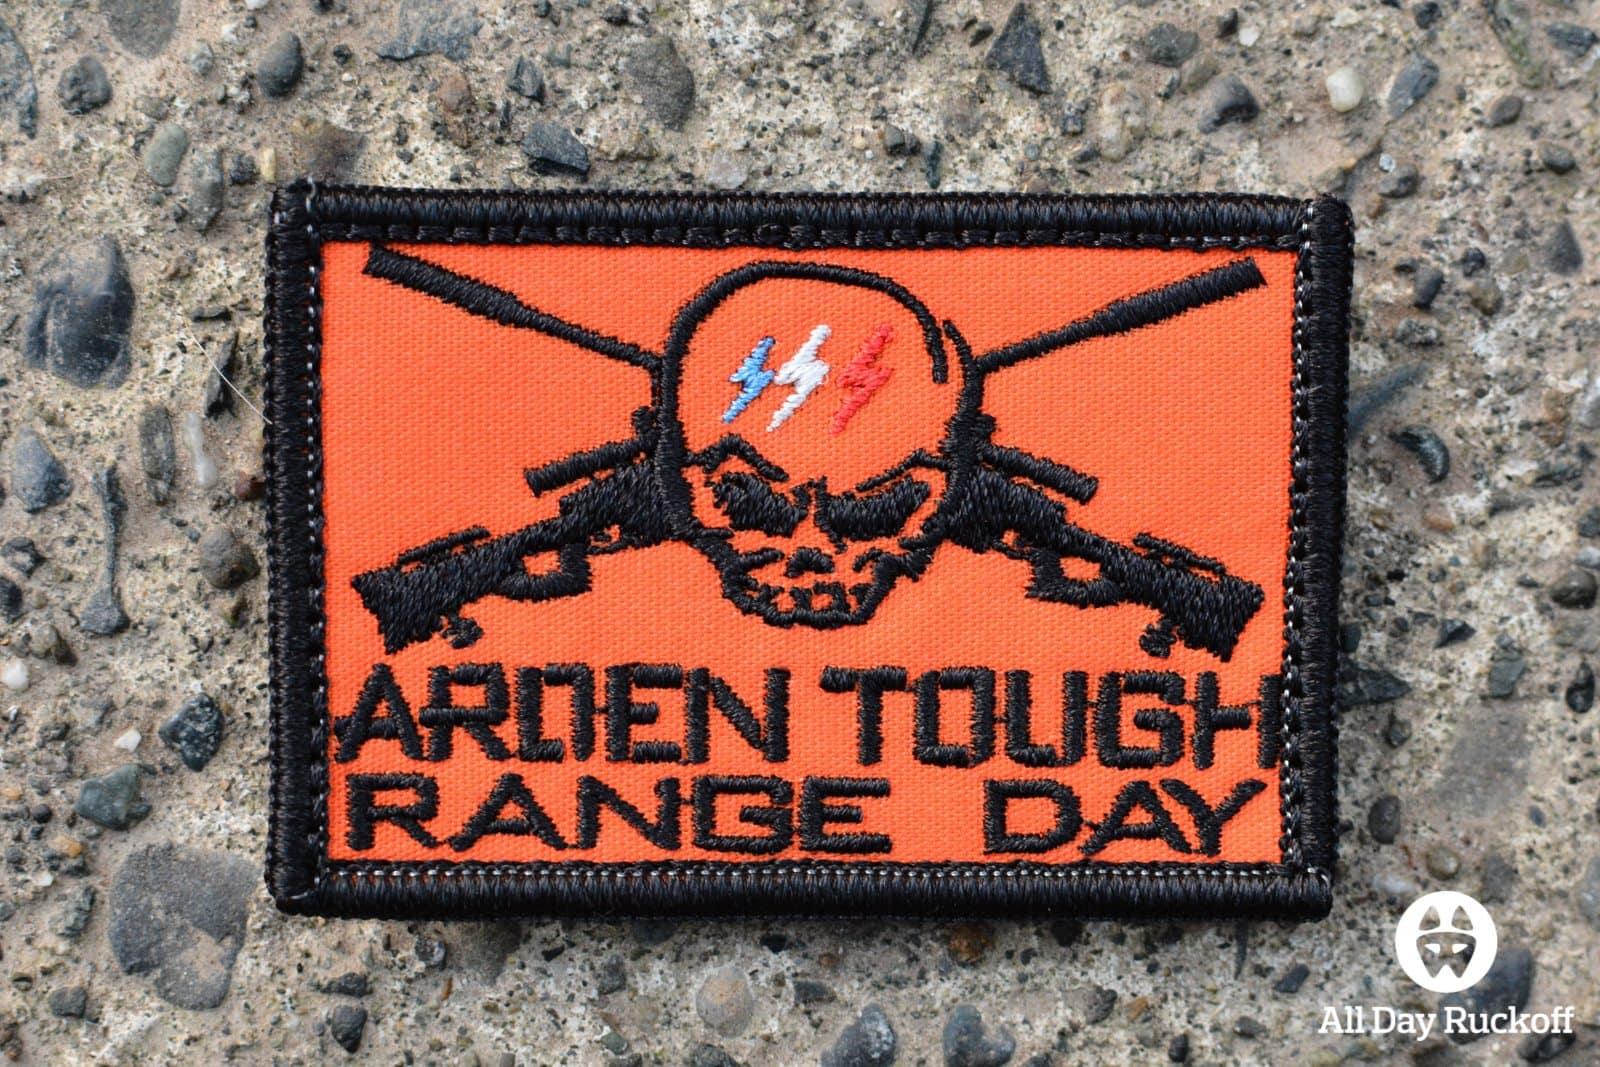 Arden Tough Range Day